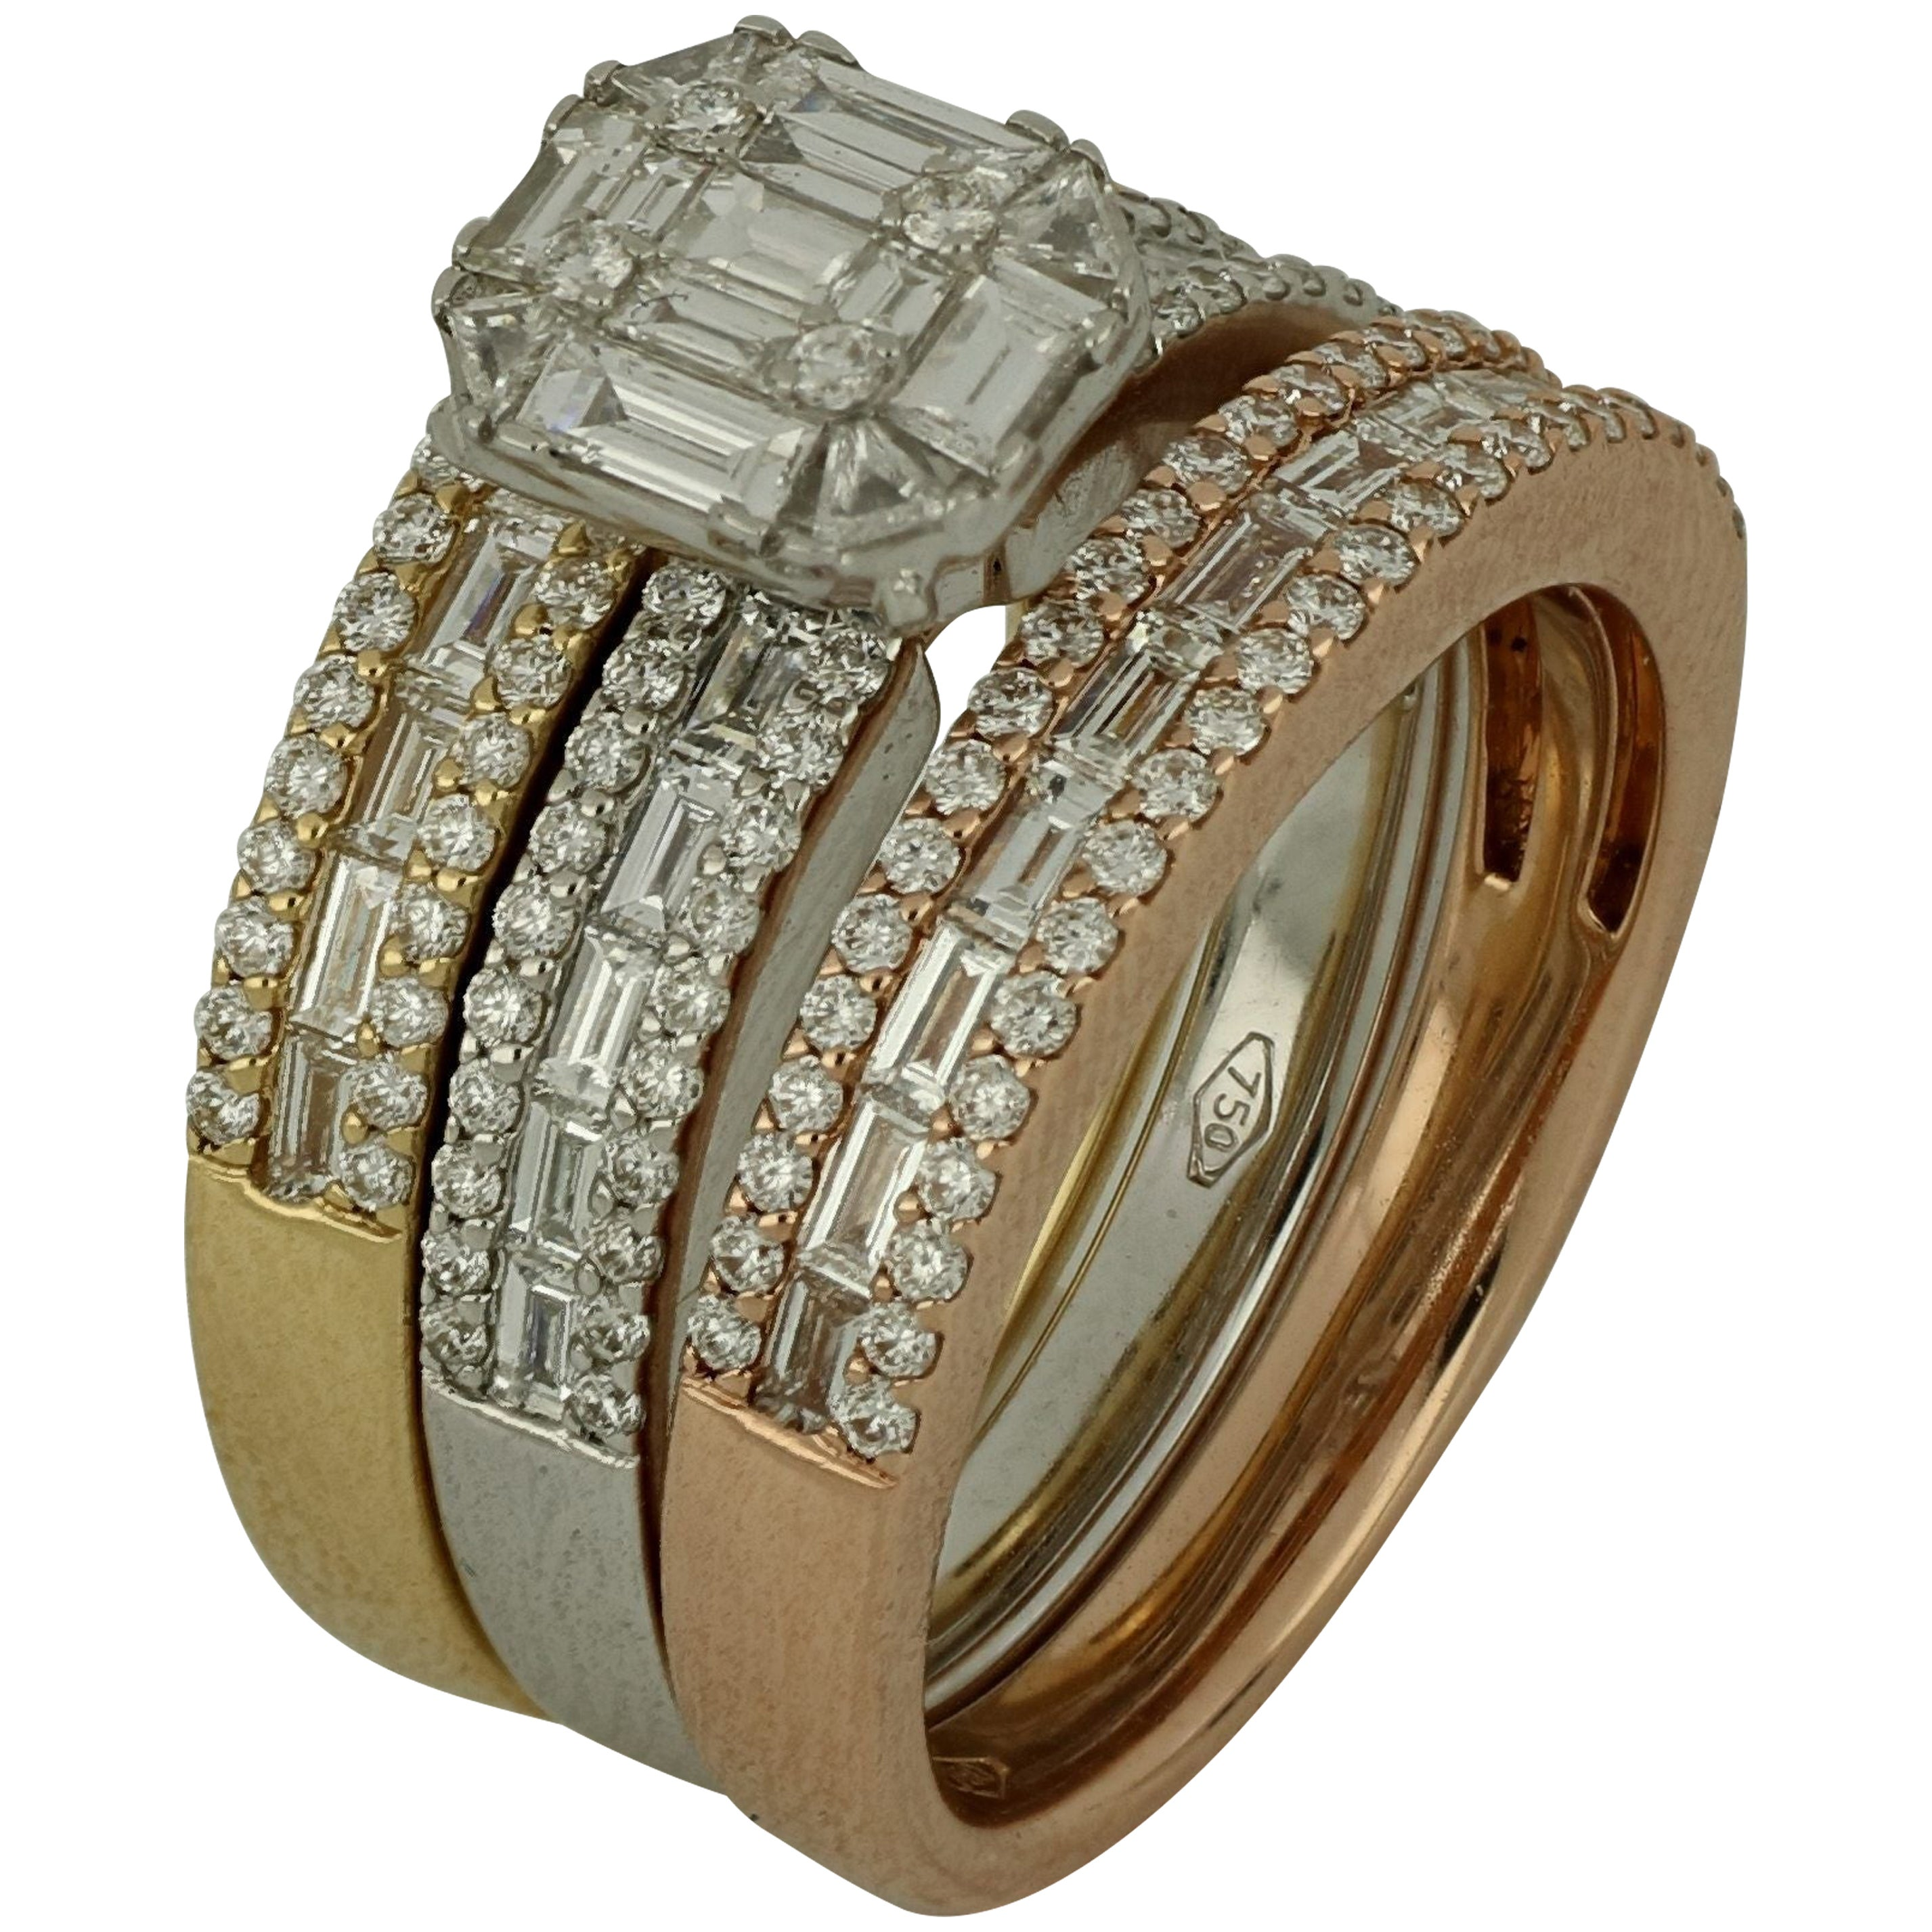 Amwaj Jewellery 18 Karat Rose, White and Yellow Gold Ring with Diamonds